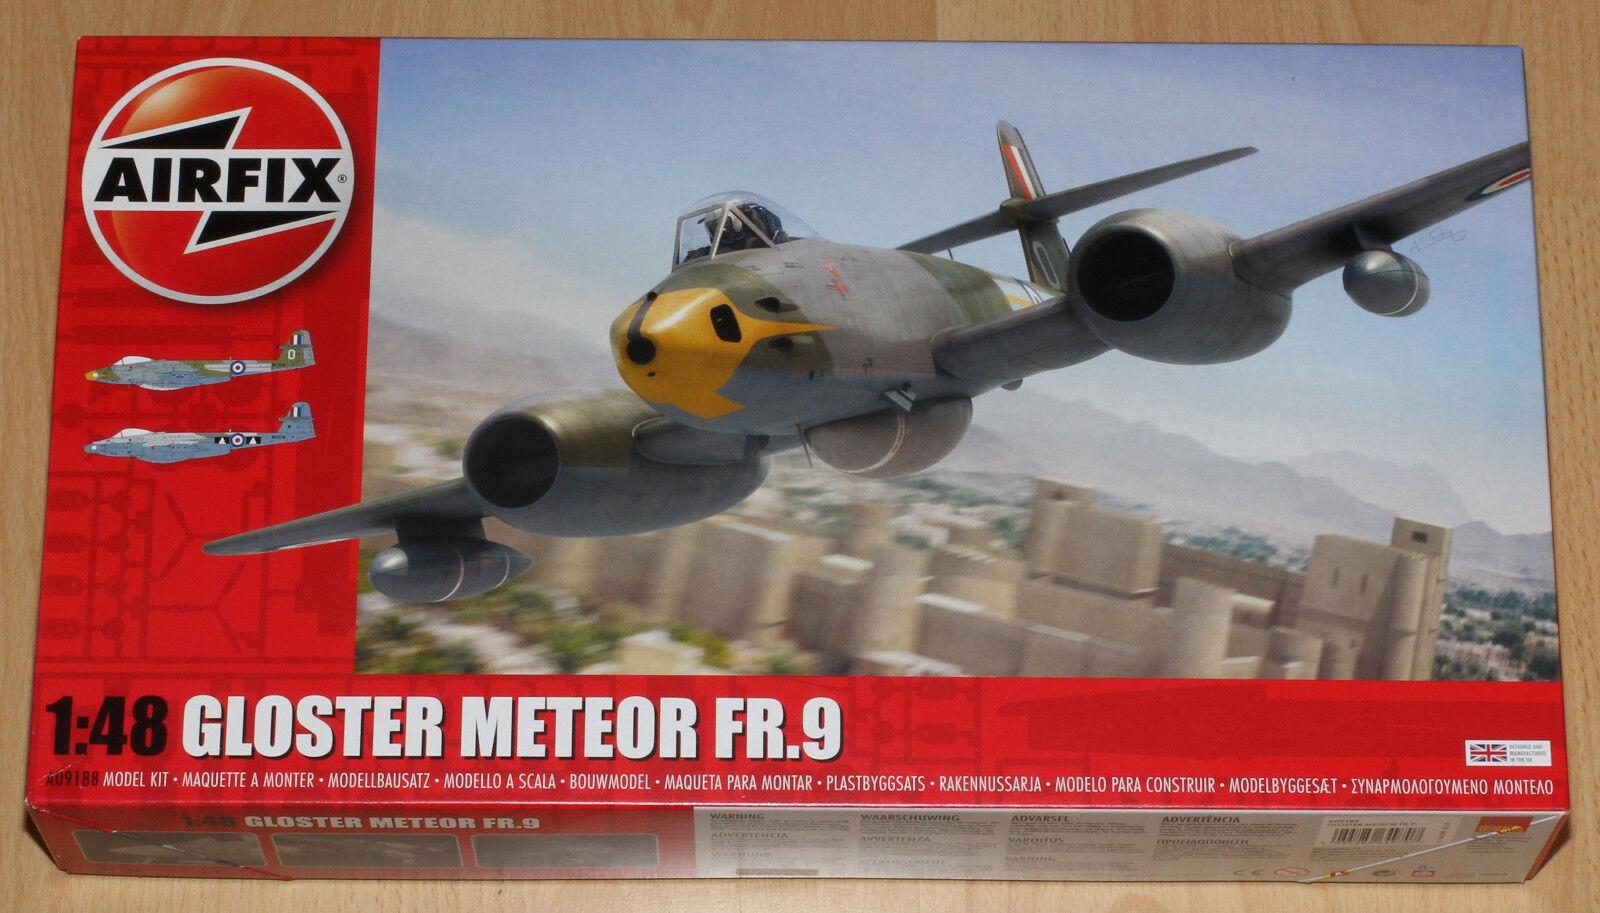 Airfix A09188 A09188 A09188 1 48  Bausatz Gloster Meteor FR.9  | Online Outlet Store  5288eb